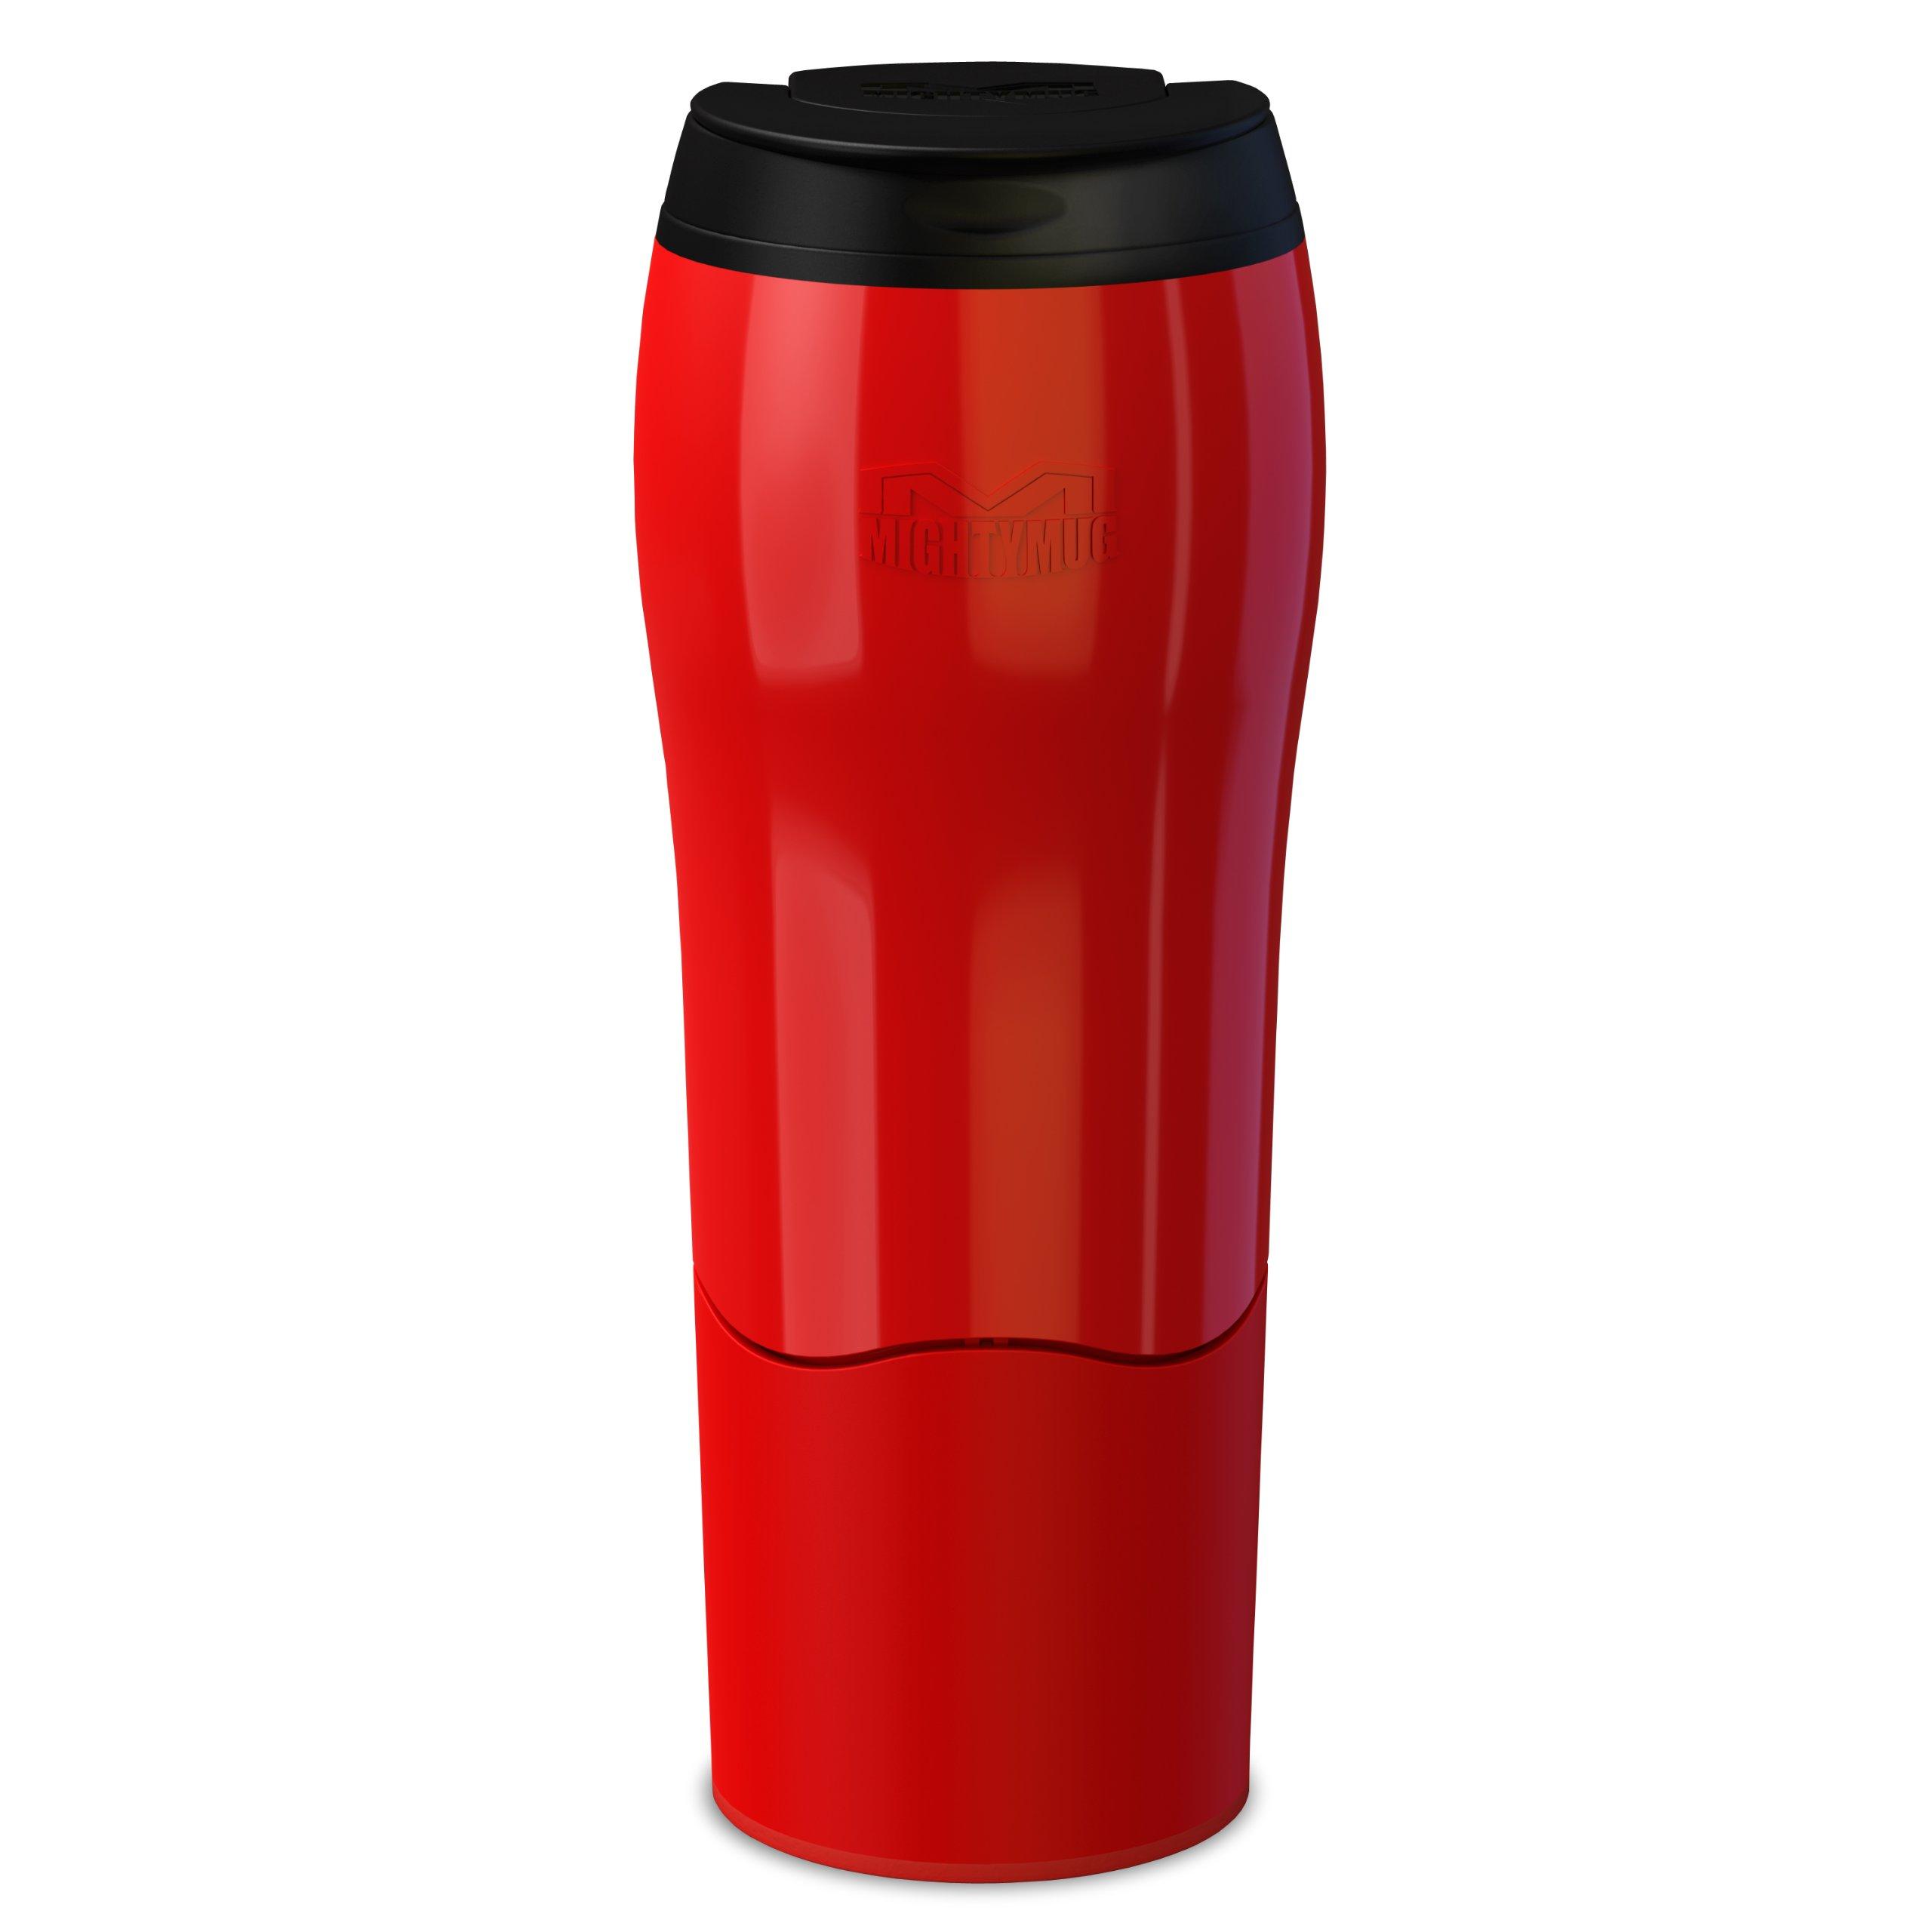 Dexam Mighty Mug Travel Mug 'the mug that won't fall over' Thermos in Red 17920225